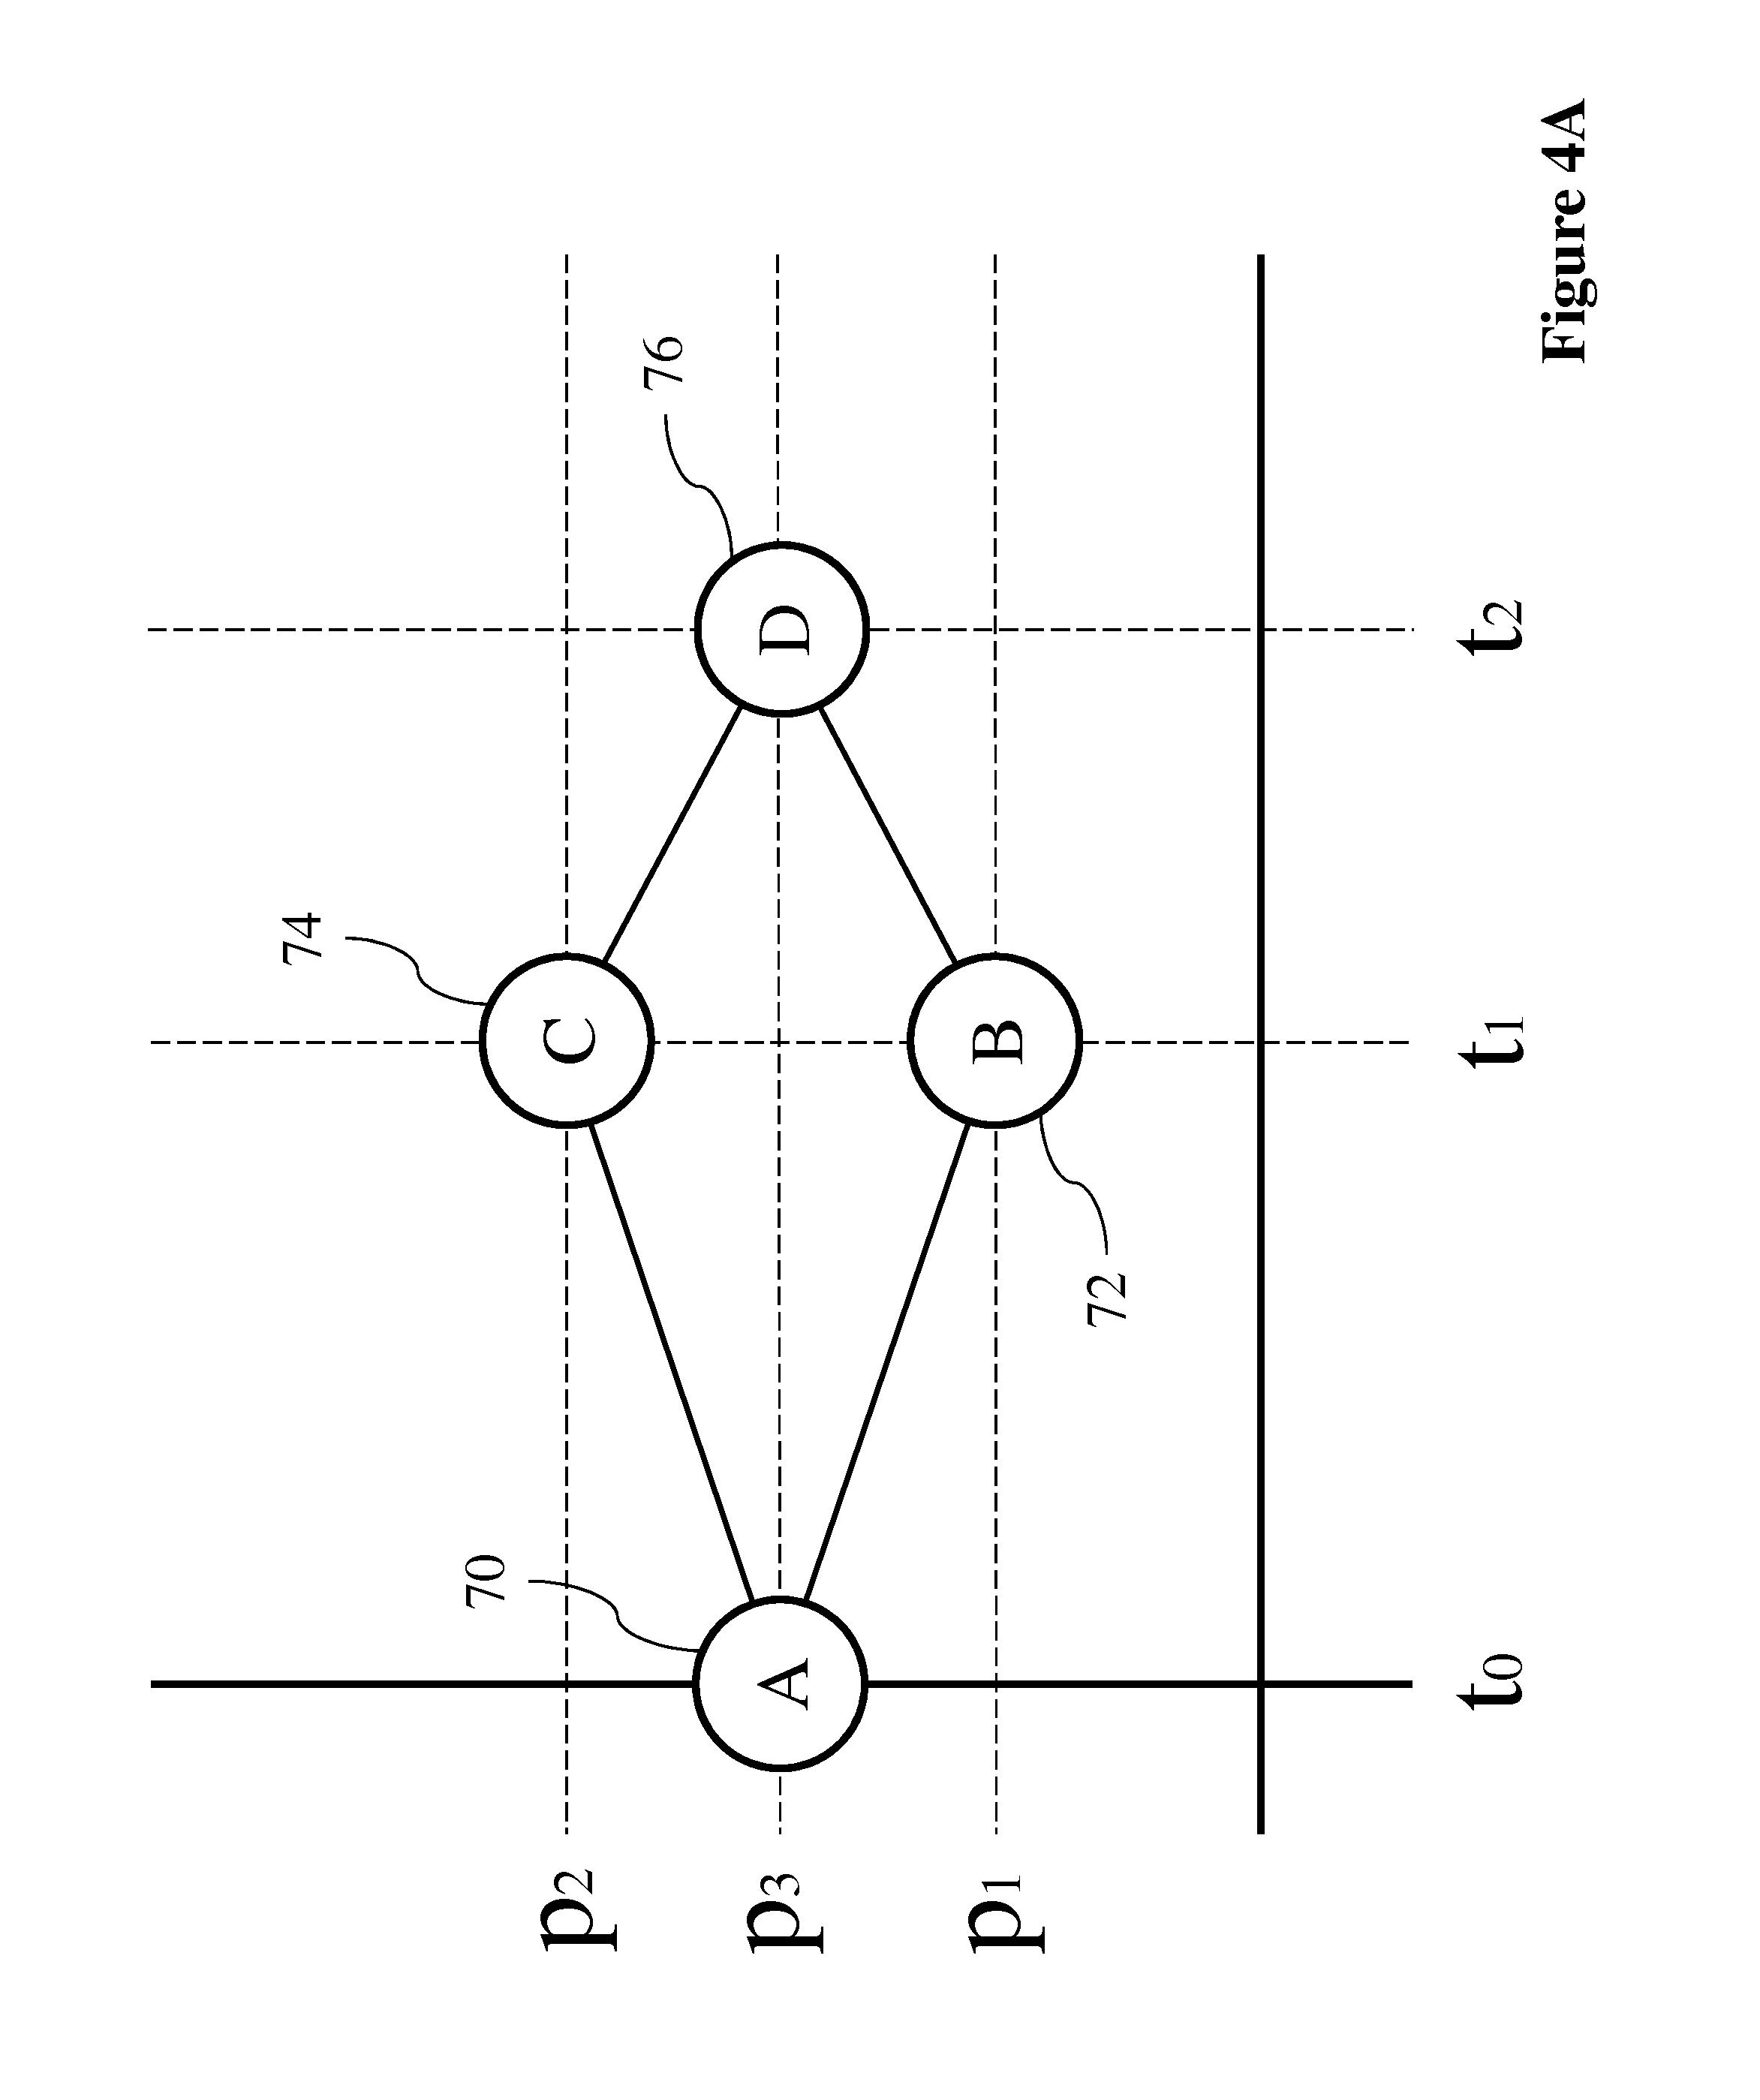 Range accrual binary options